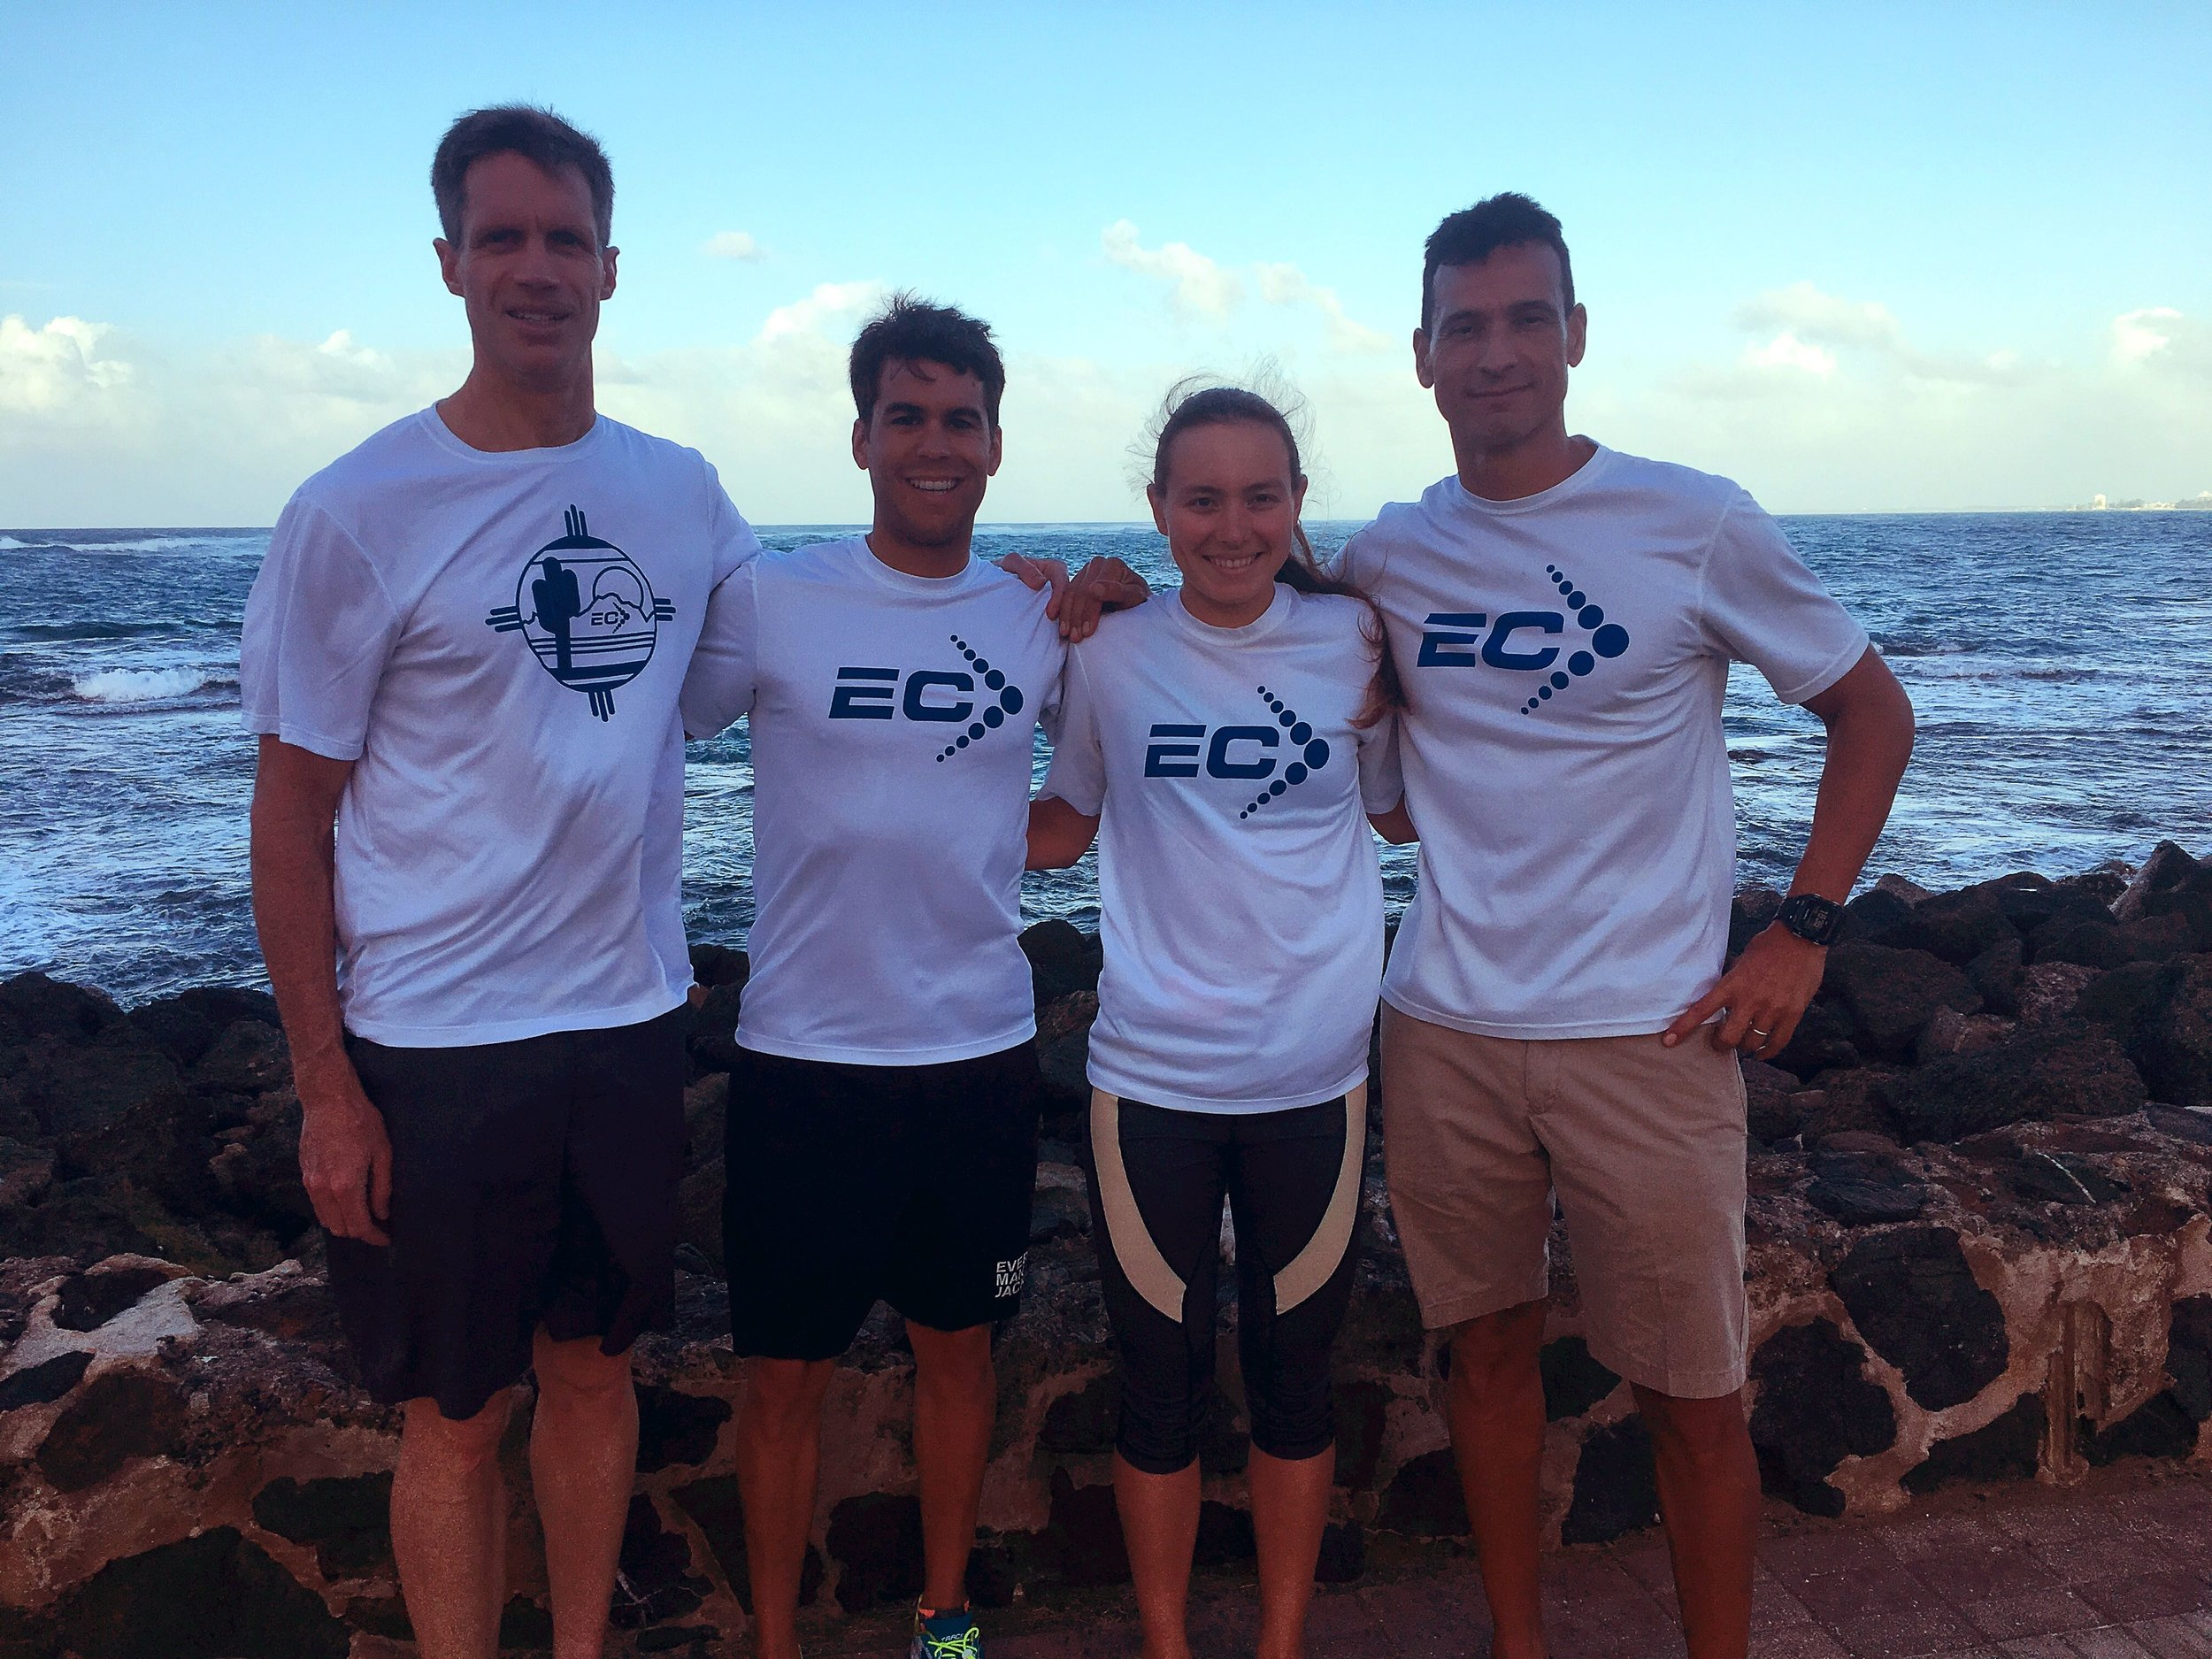 Ironman Puerto Rico 70.3 Endurance Corner